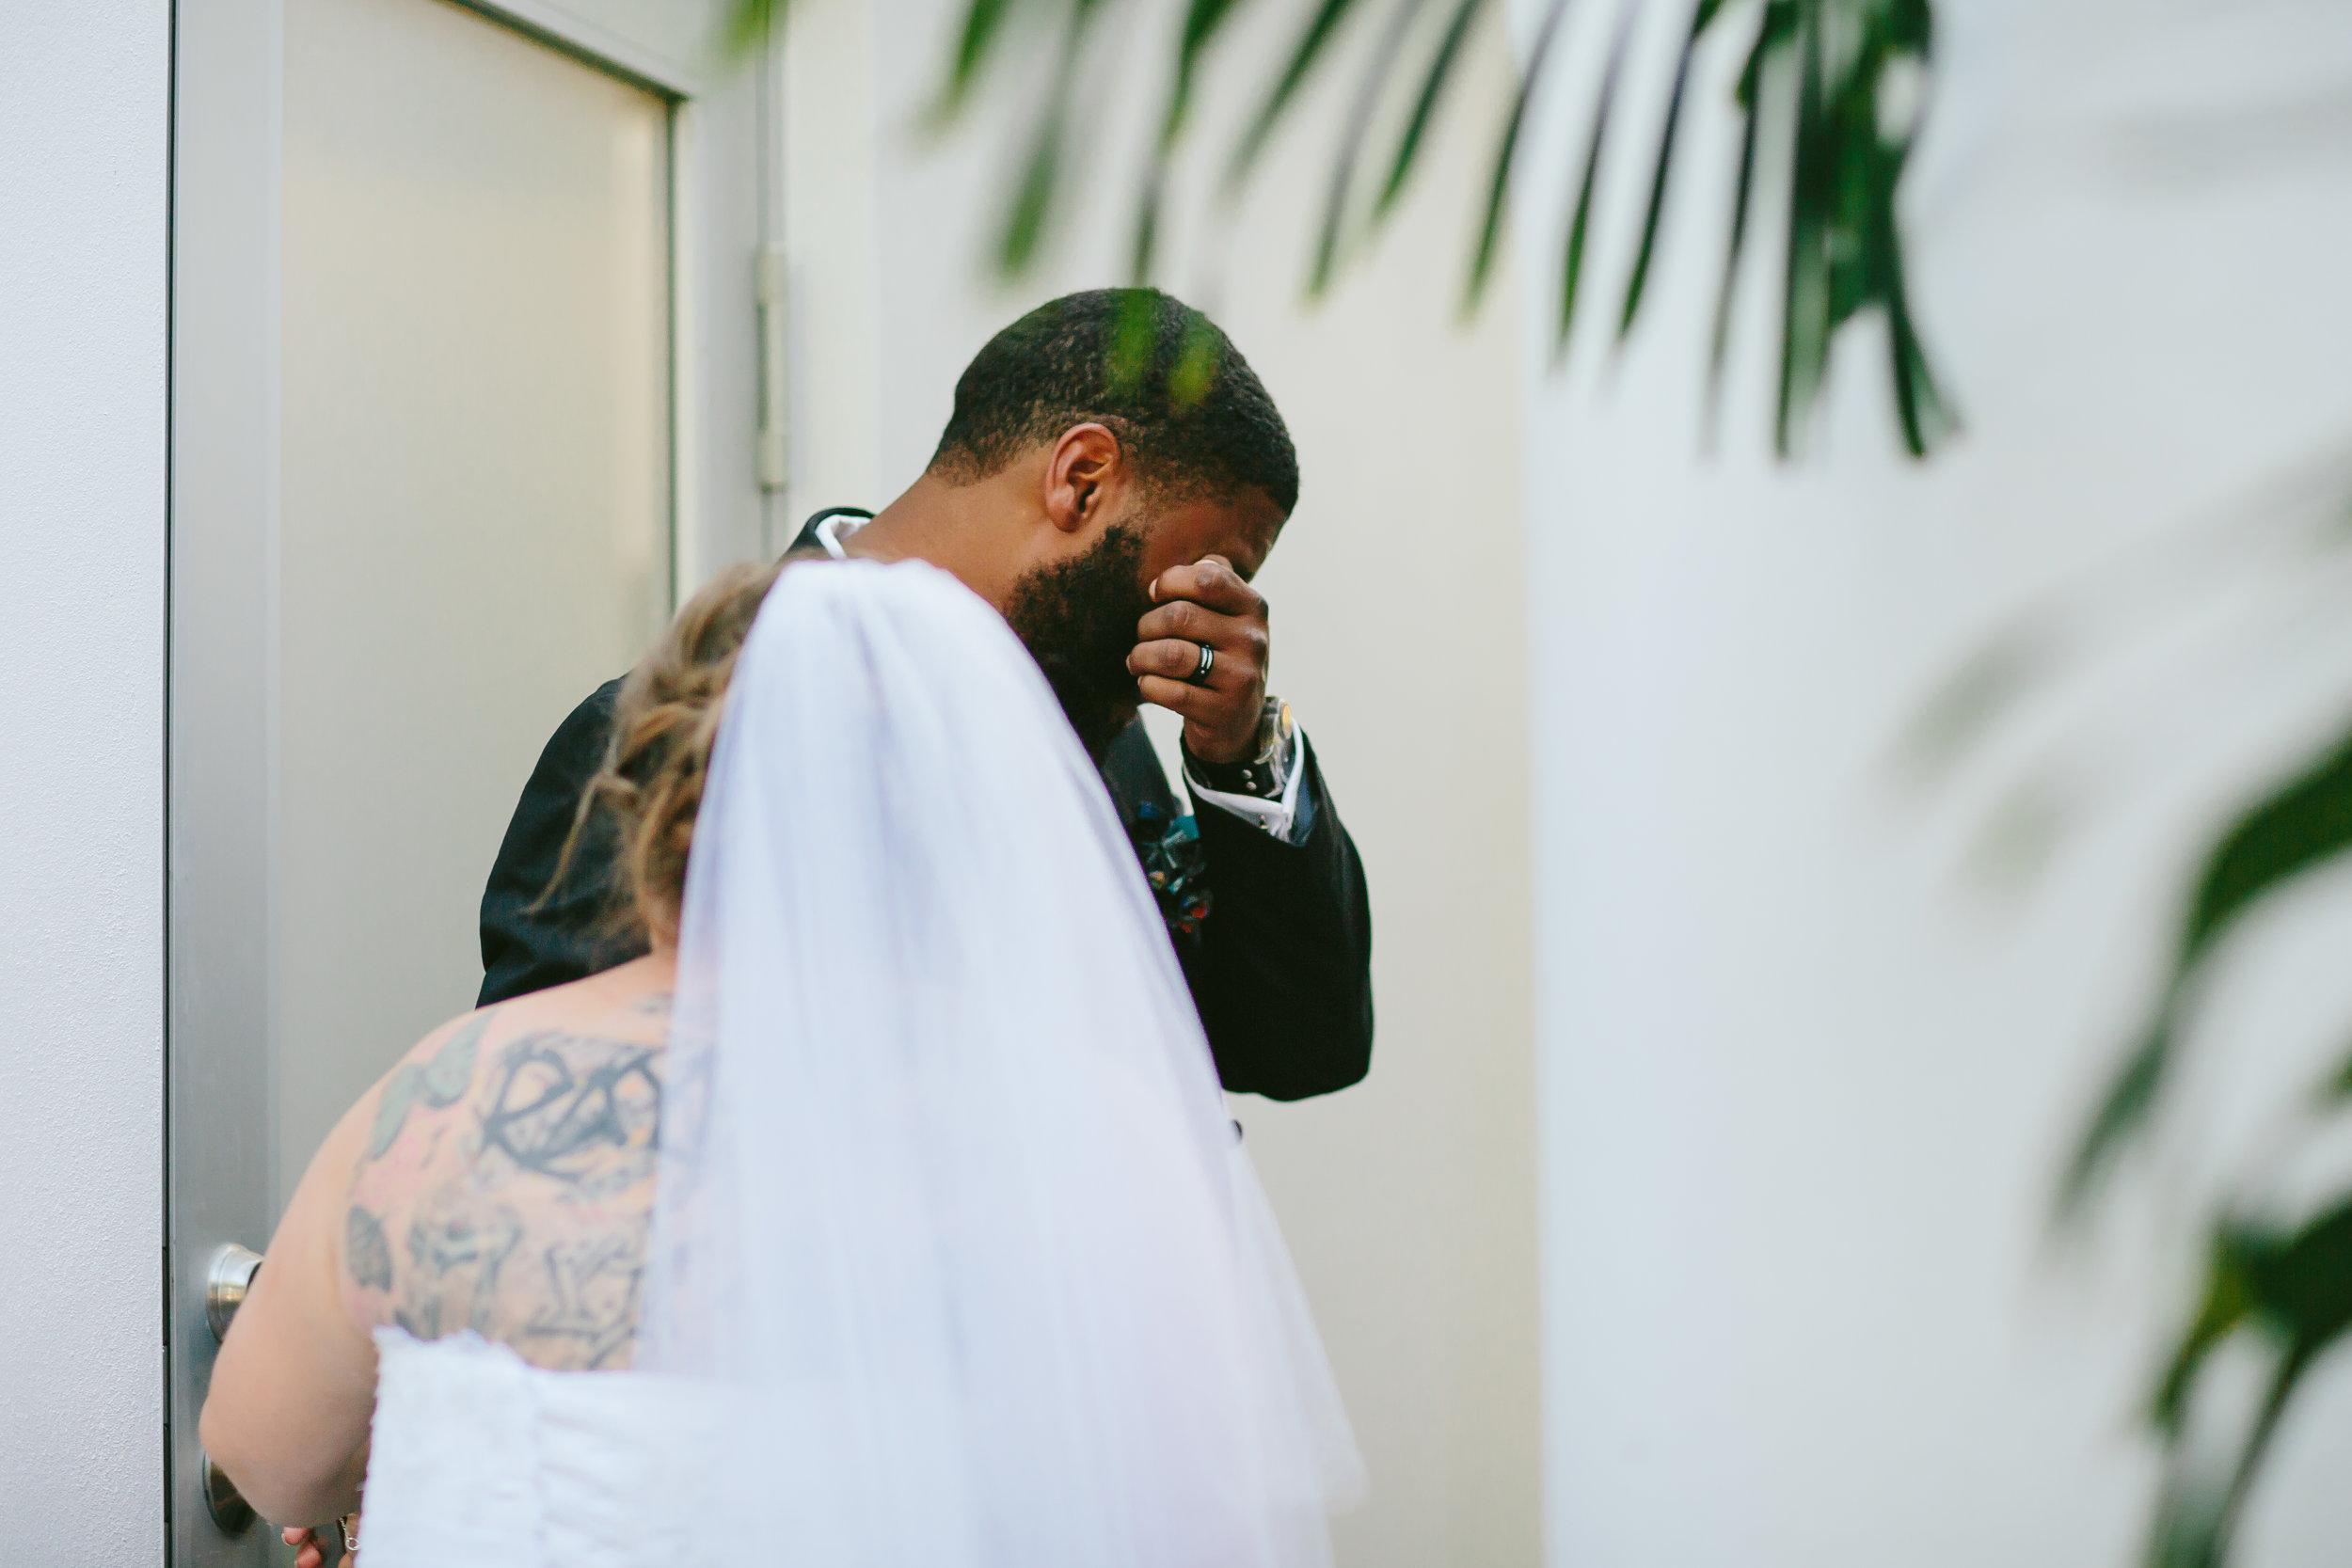 emotional-groom-crying-ceremony-tiny-house-photo-florida-weddings.jpg